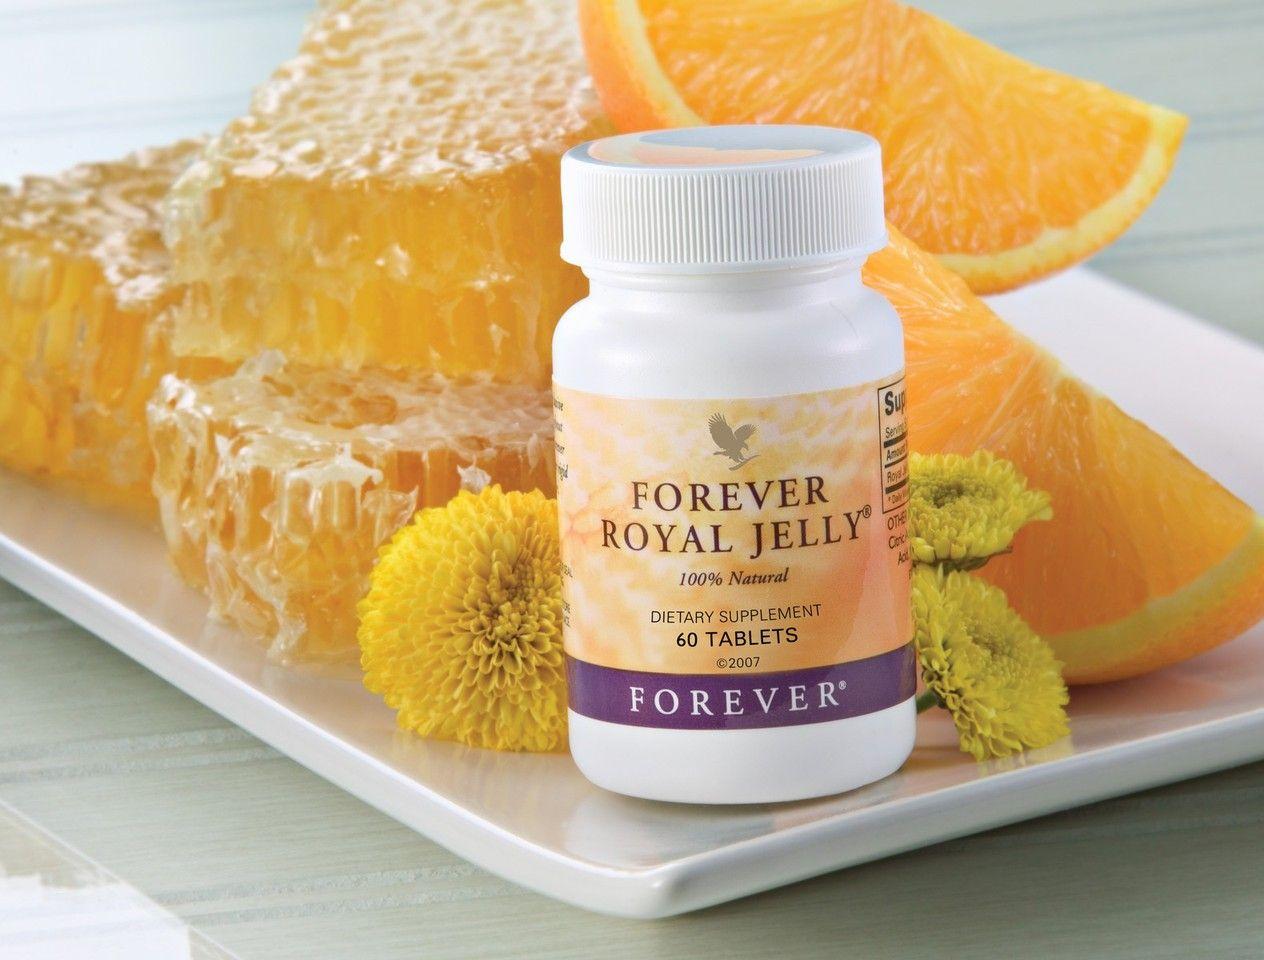 غذاء ملكات النحل رويال جيلي الفوائد وأفضل الأنواع In 2020 Royal Jelly Forever Living Products Forever Royal